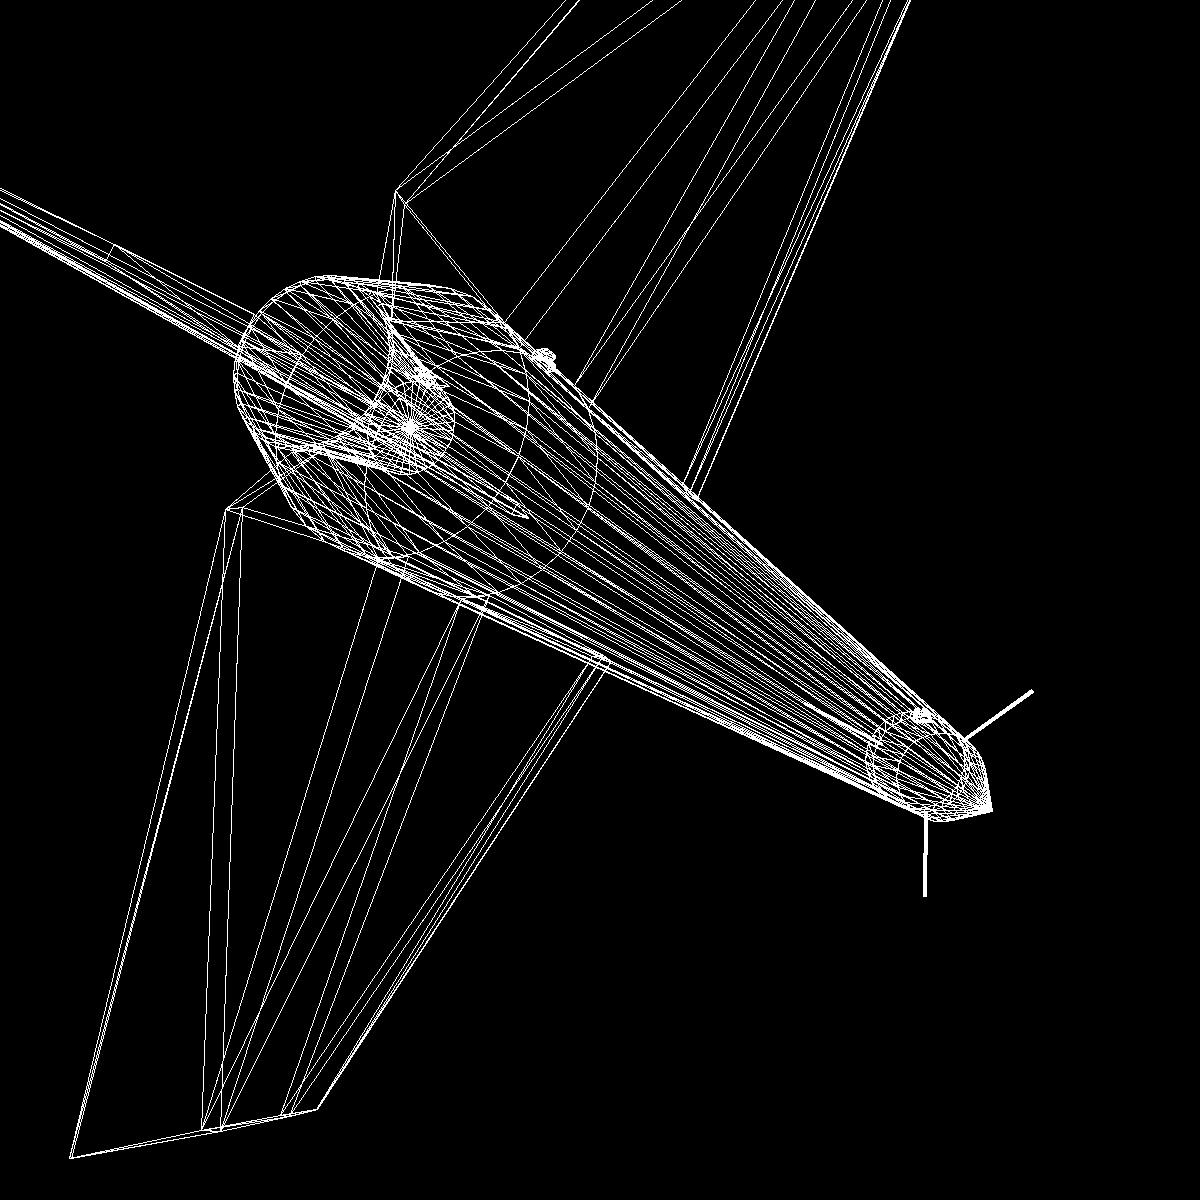 black brant ii sounding rocket 3d model 3ds dxf cob x obj 150853